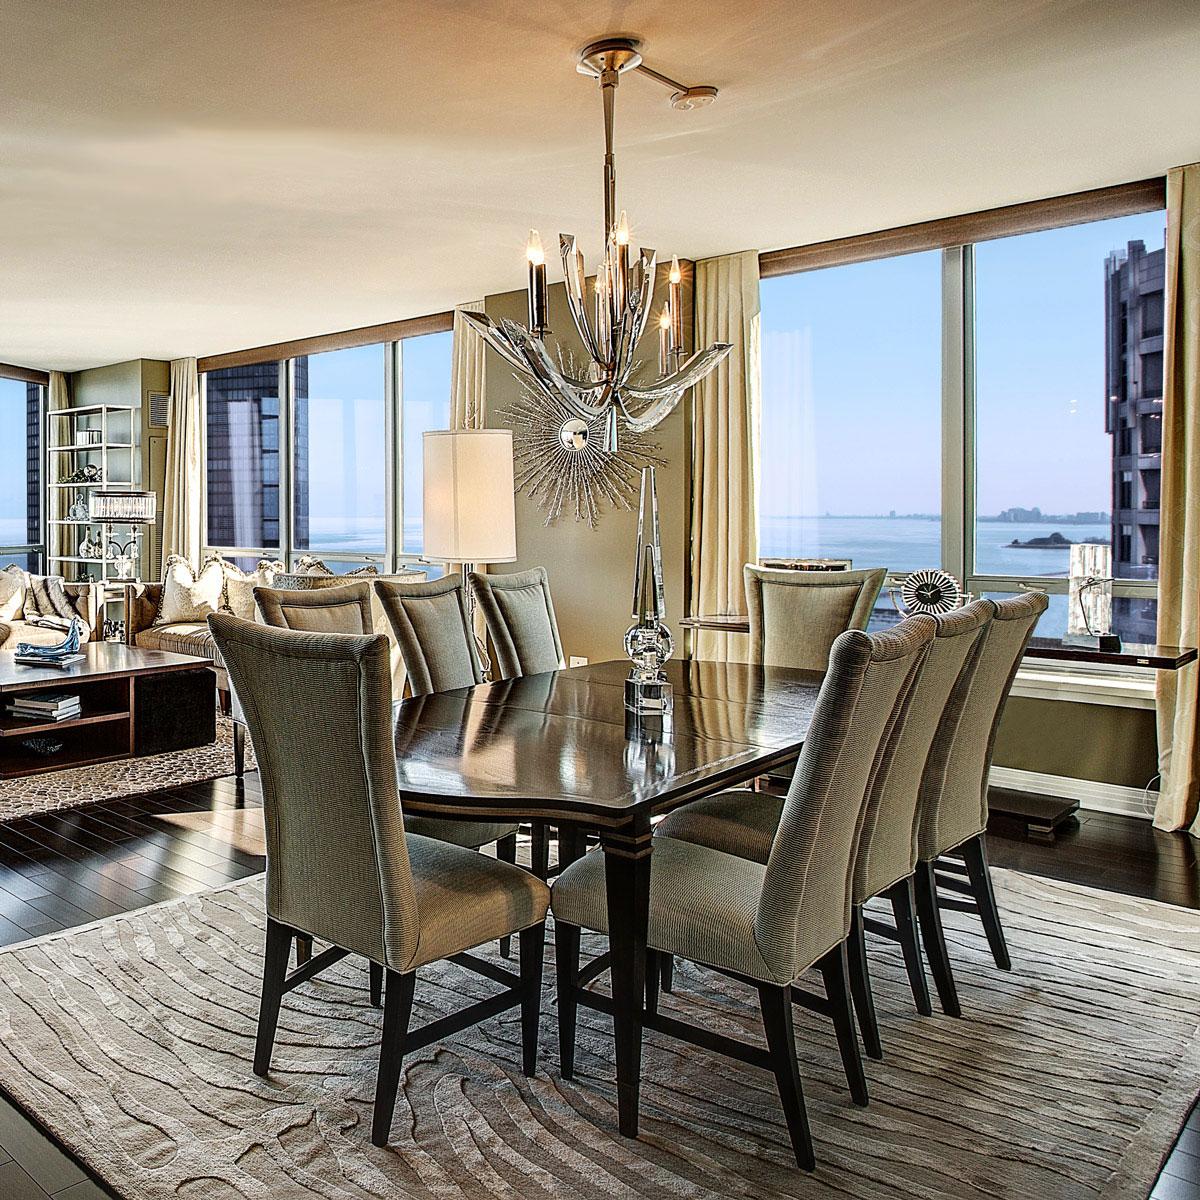 Luxury Fine Home Interior: Dining Room Decor